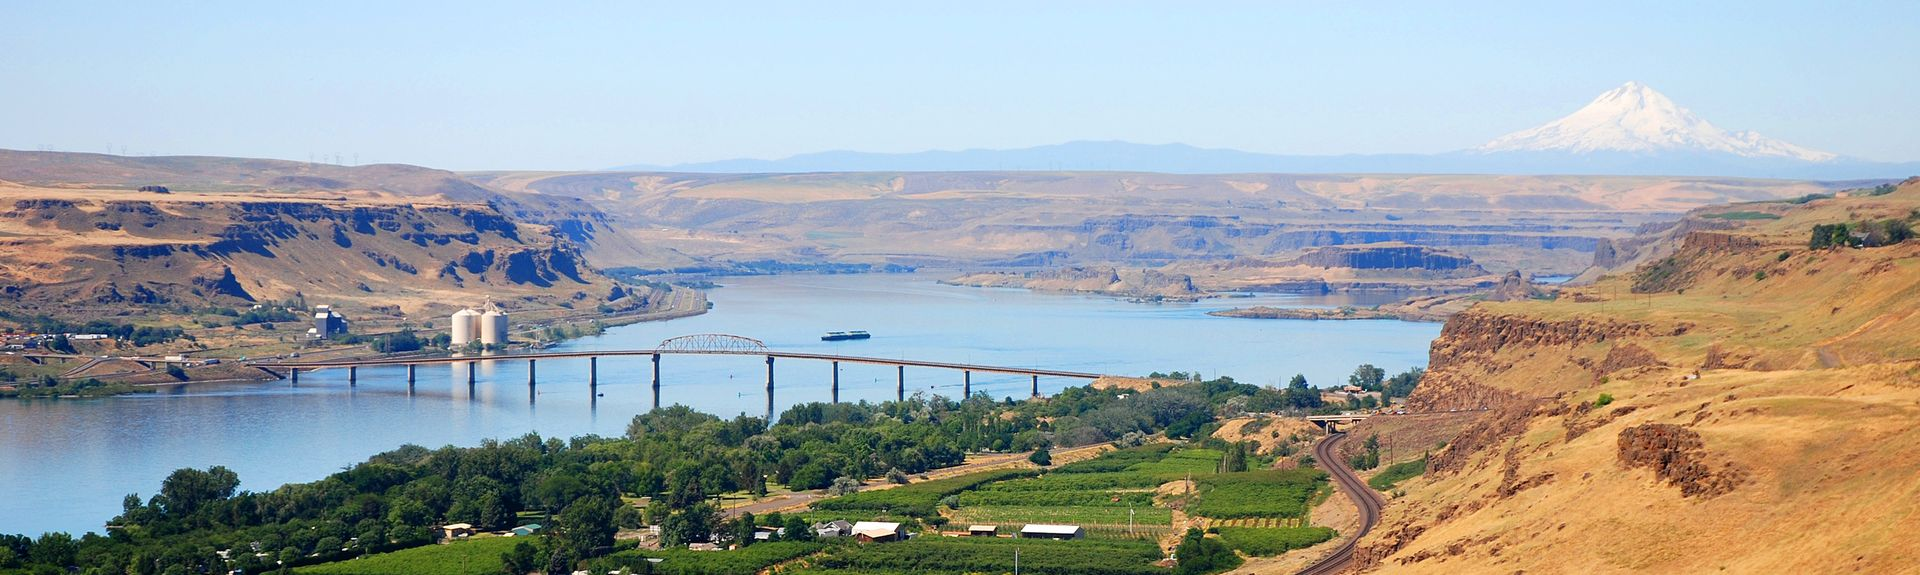 The Dalles, Oregon, USA